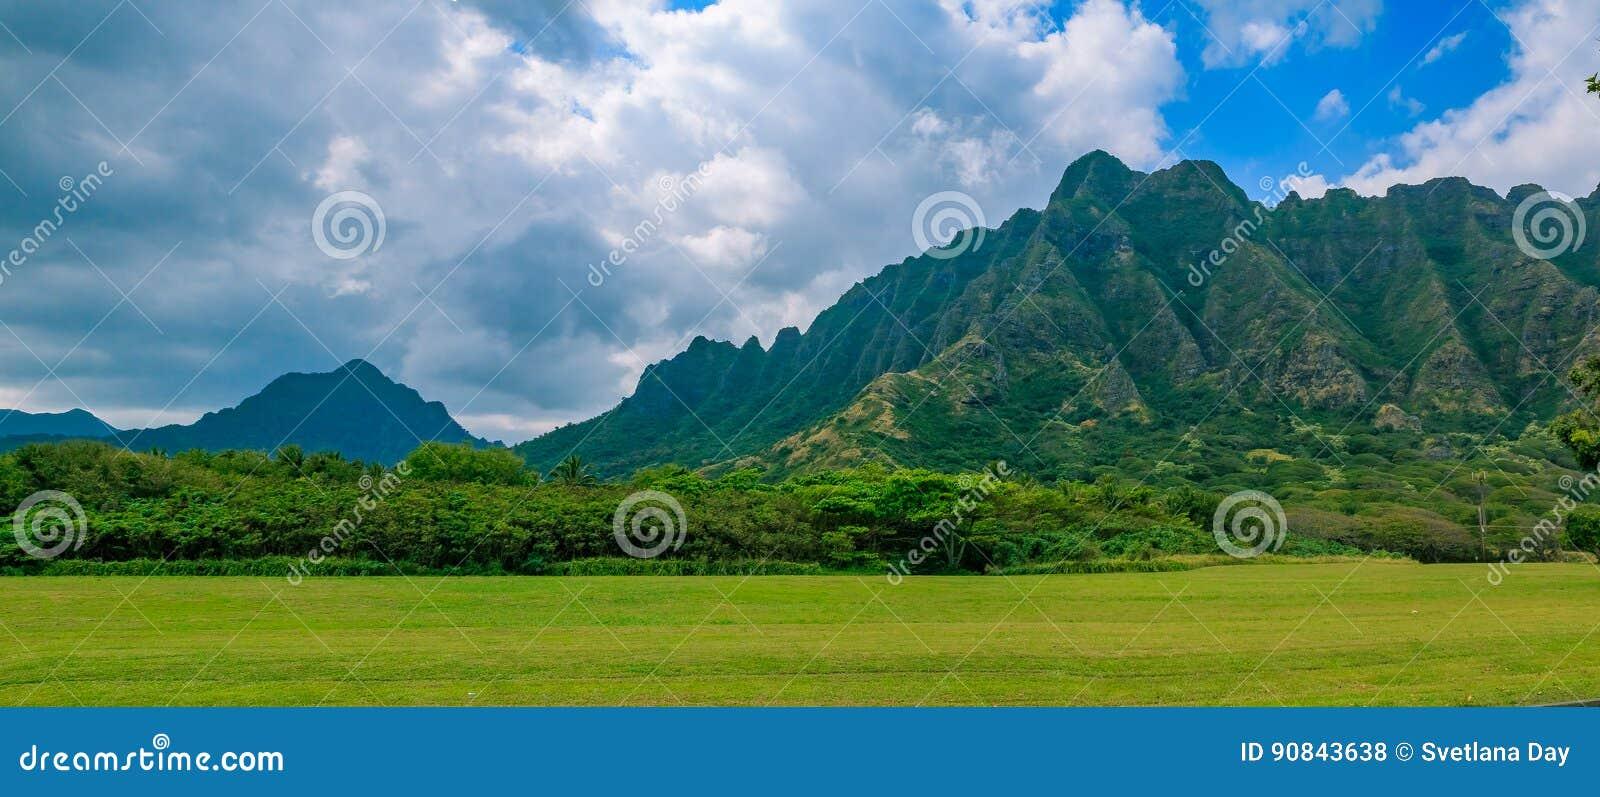 Panorama de la cordillera por el rancho famoso de Kualoa en Oahu, H